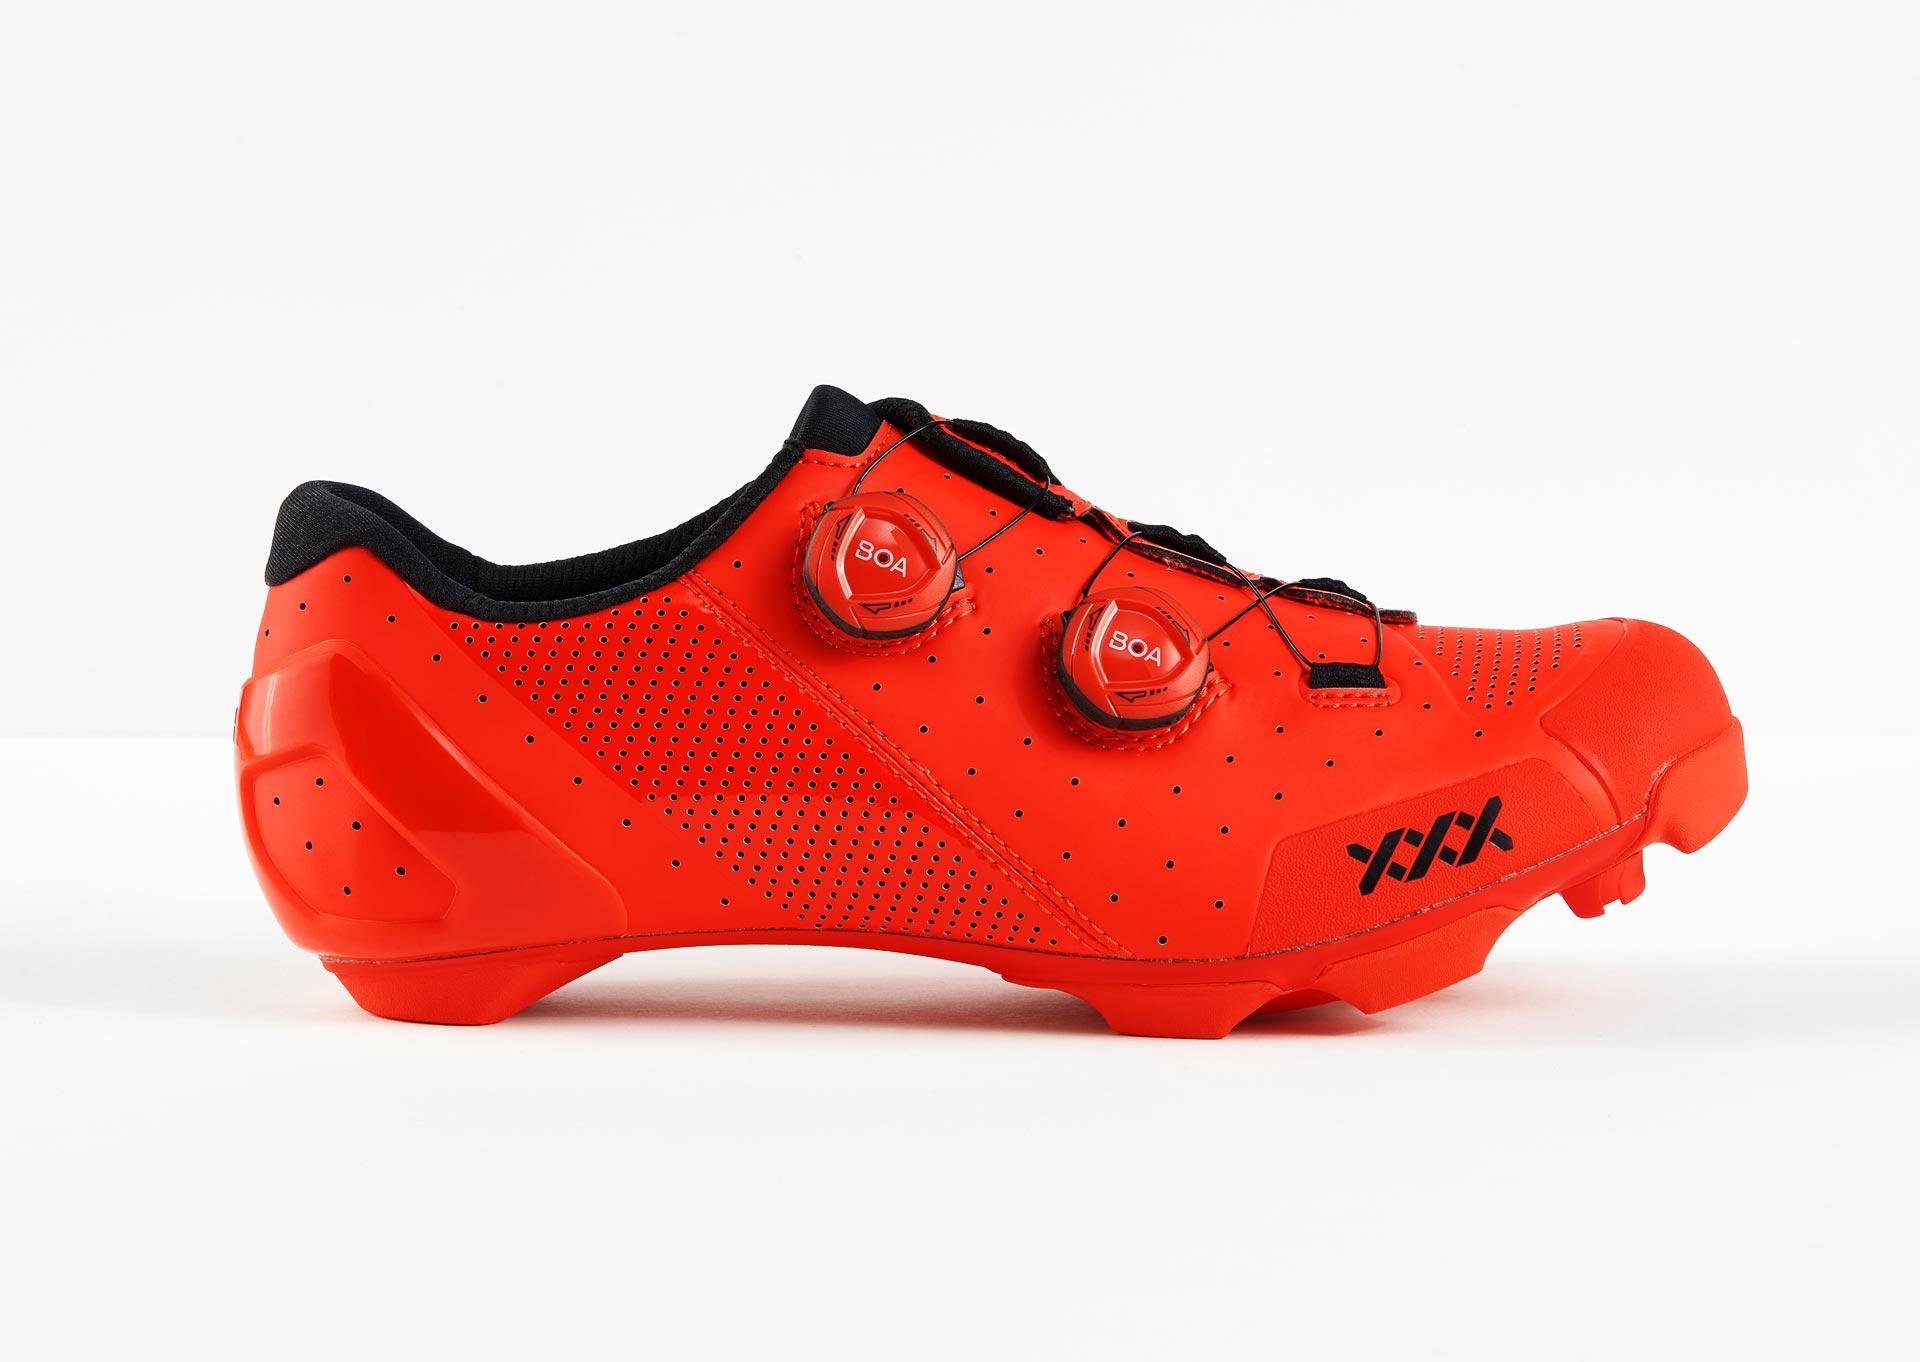 Red Triple-X mountain biking shoes